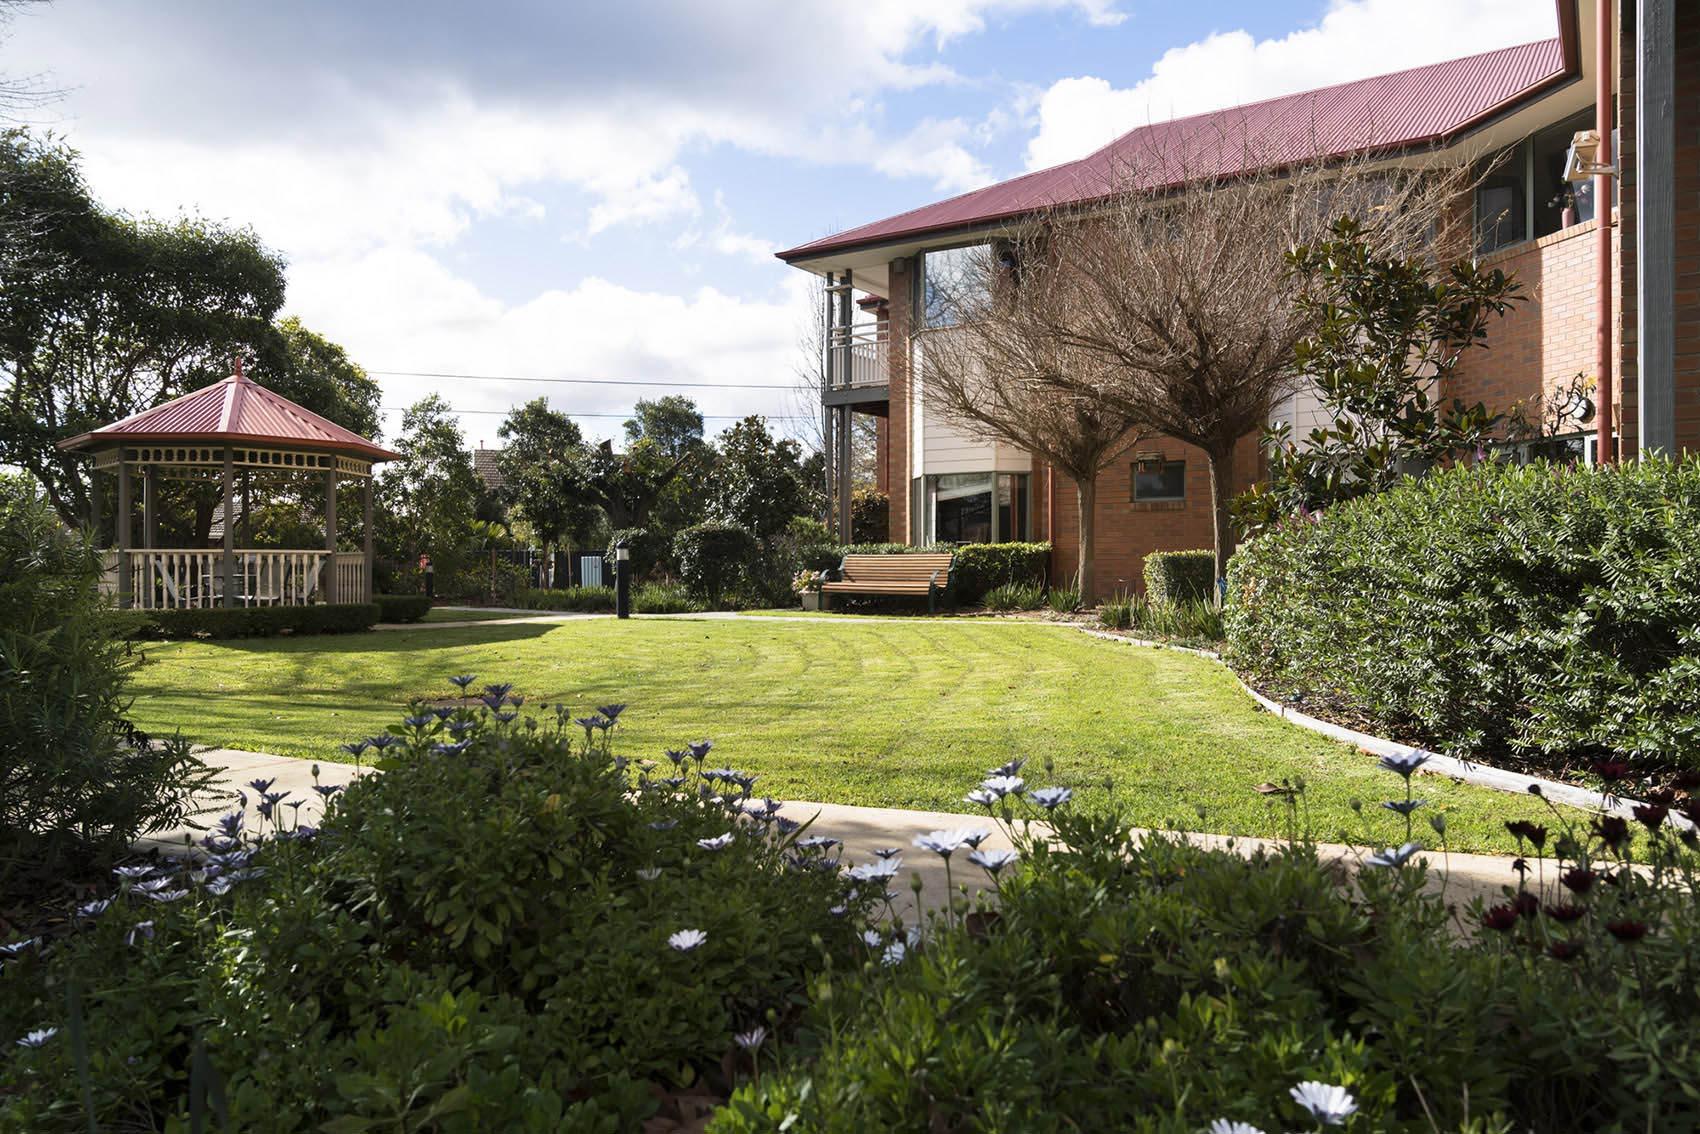 https://www.regis.com.au/site/wp-content/uploads/2016/04/Aged-Care-Home-Camberwell-Melbourne.jpg